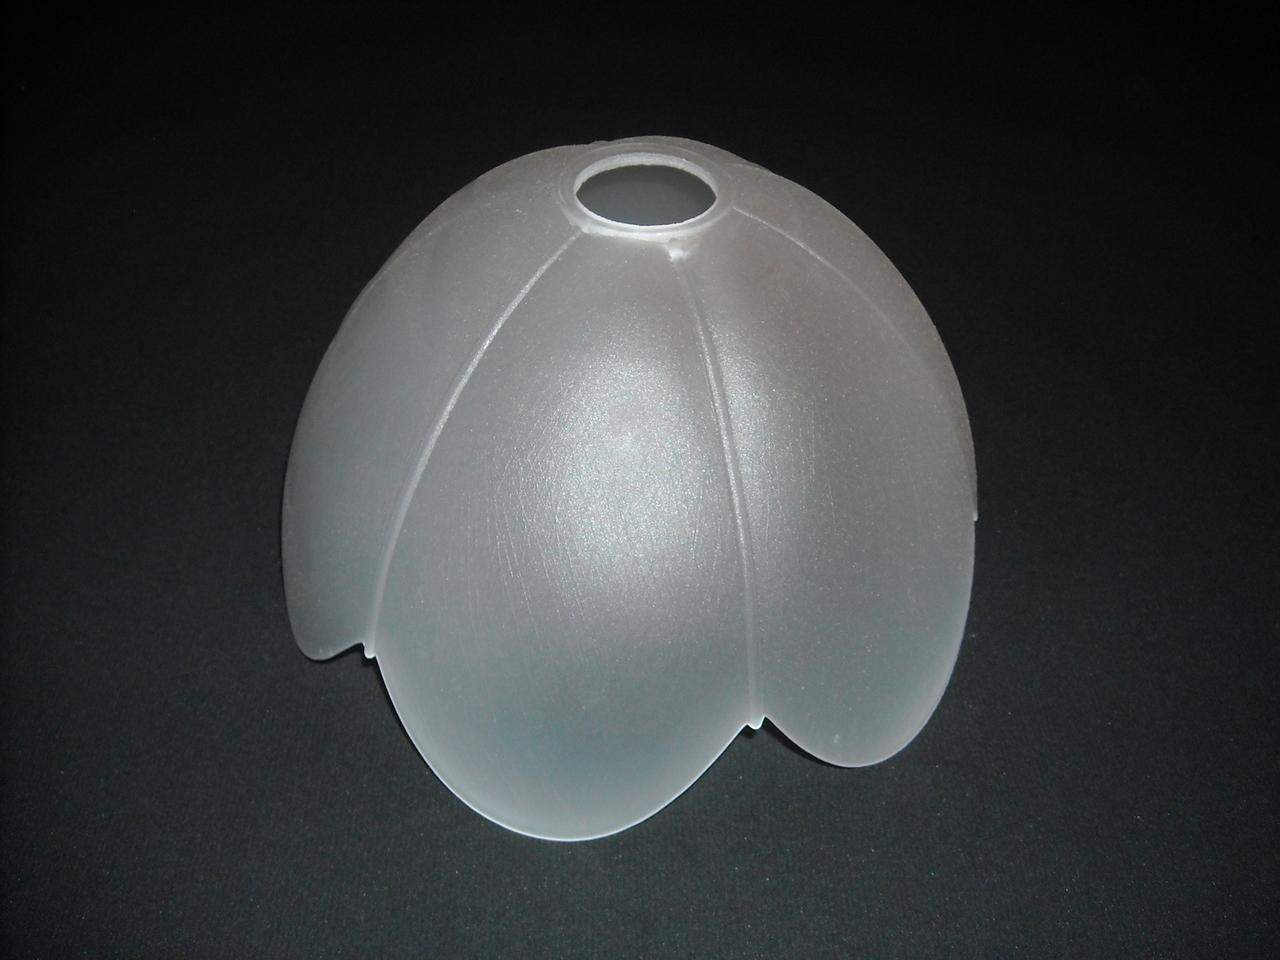 lampenschirm aus glas glasschirm wei k0241w1 ca 25. Black Bedroom Furniture Sets. Home Design Ideas